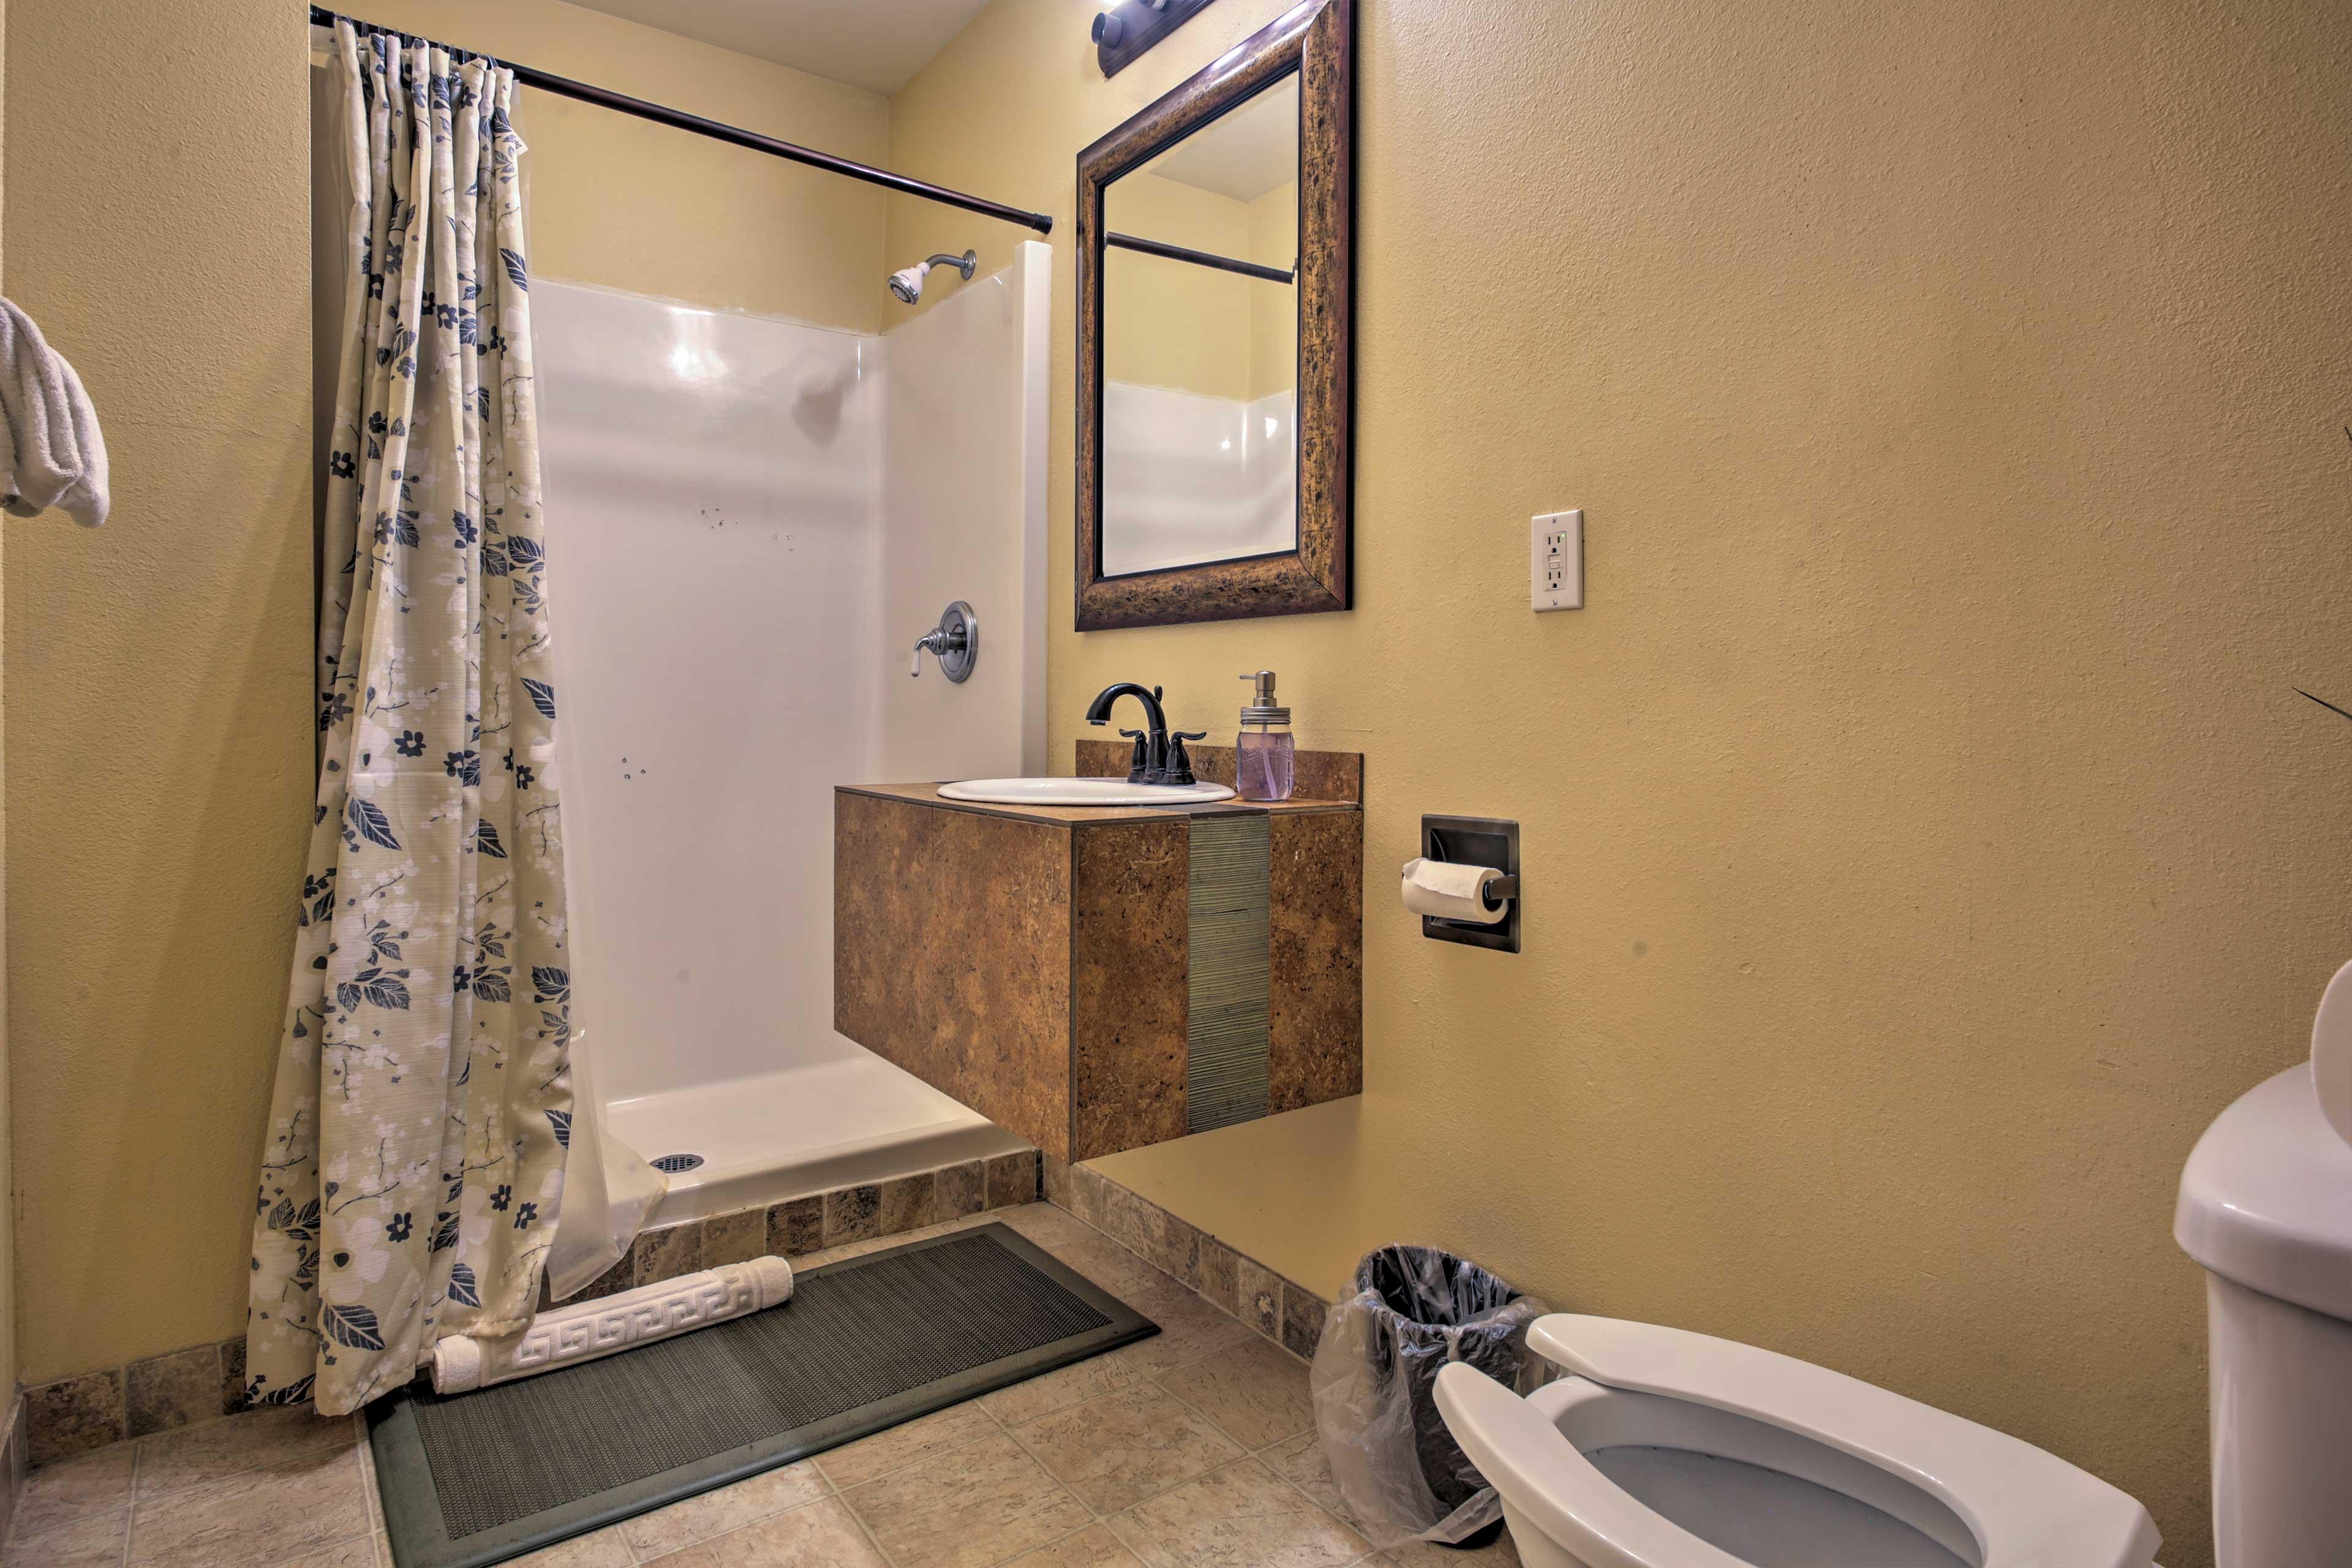 Rinse your worries away in the walk-in shower in the en-suite full bathroom.